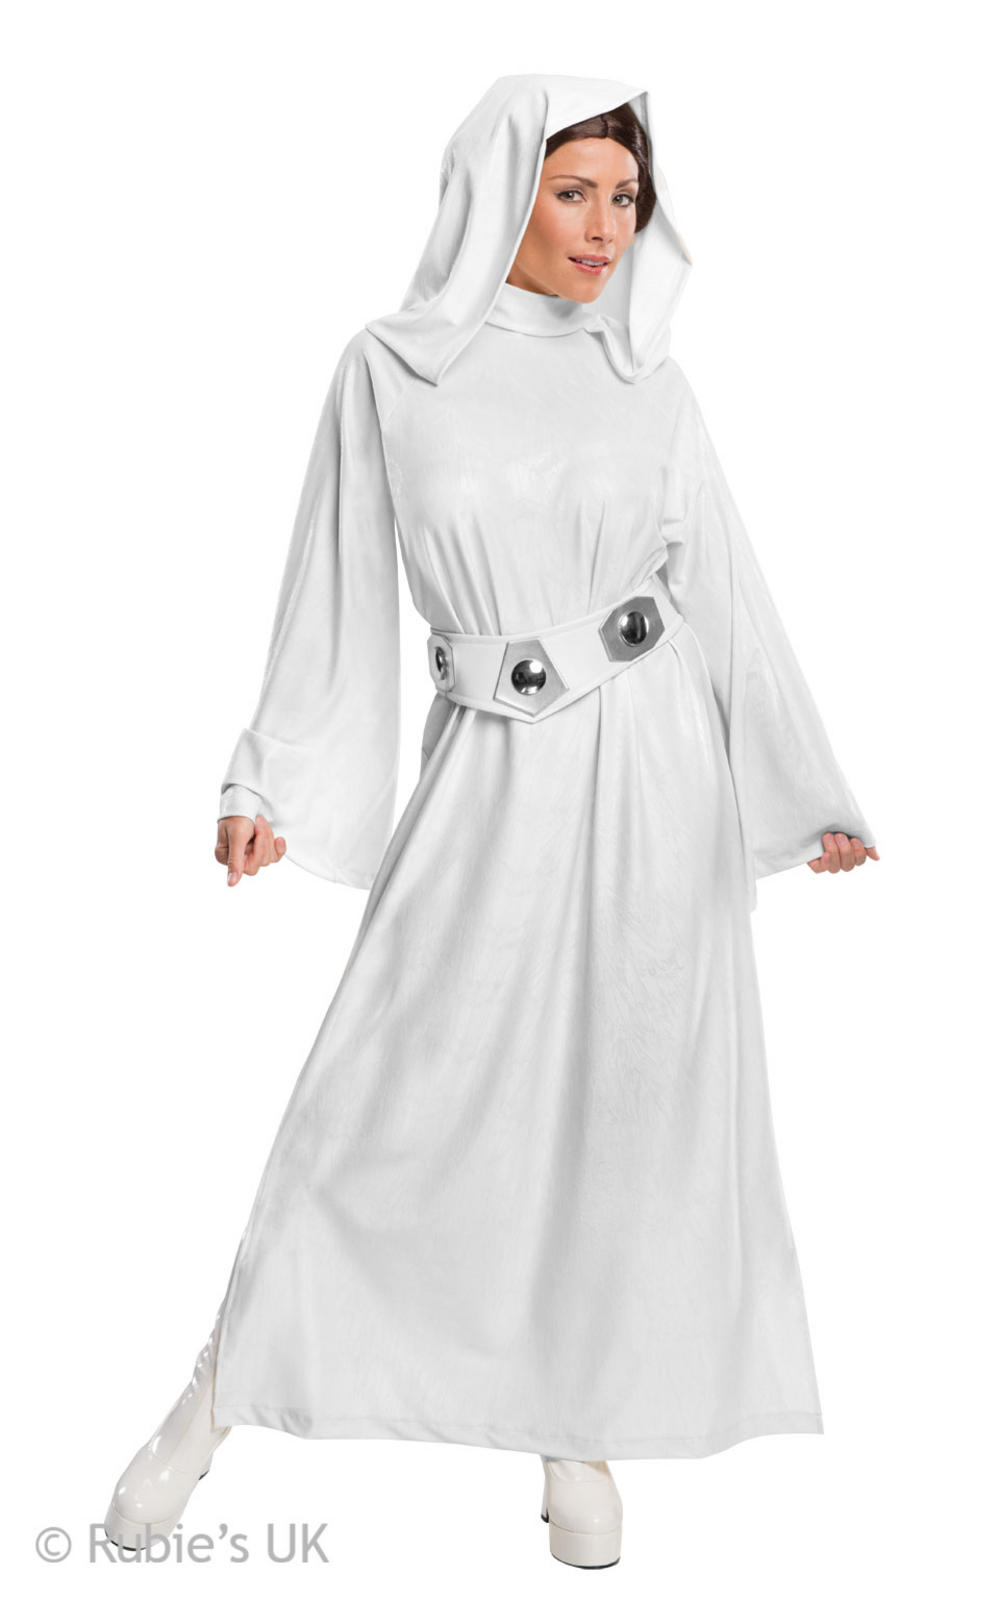 Princess Leia Ladies Star Wars Costume